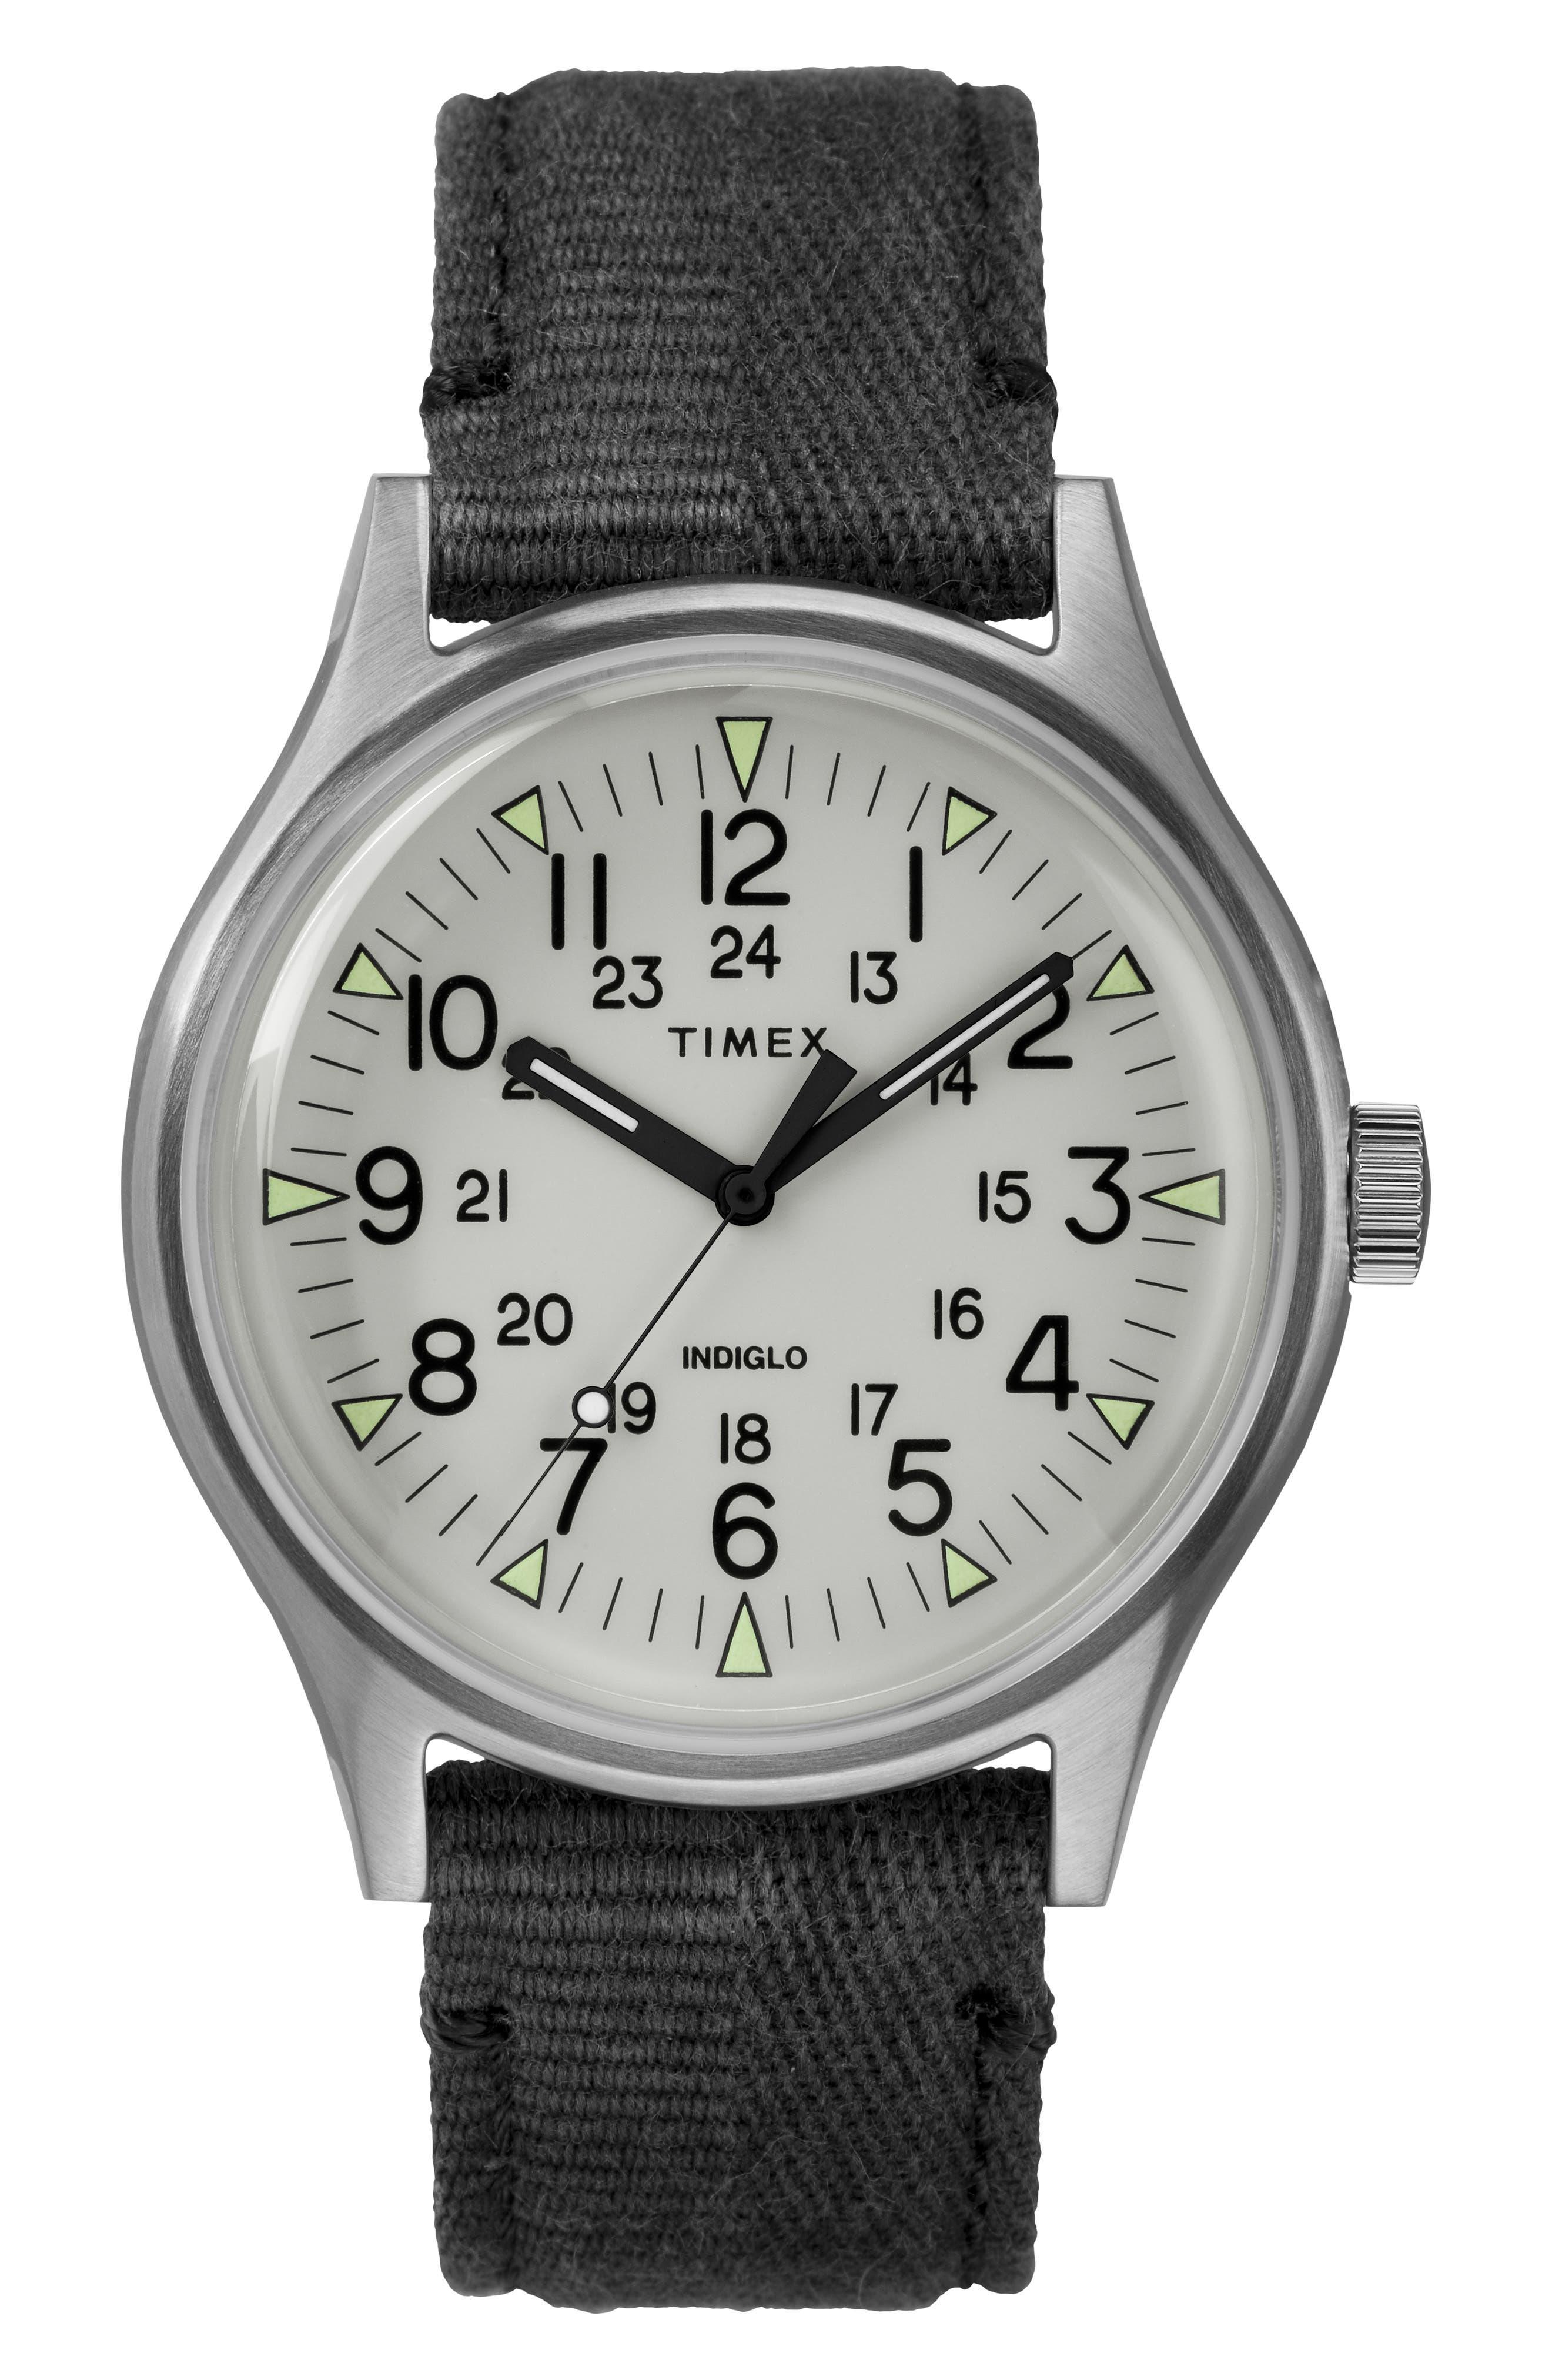 MK1 Canvas Strap Watch,                             Main thumbnail 1, color,                             BLACK/ WHITE/ SILVER